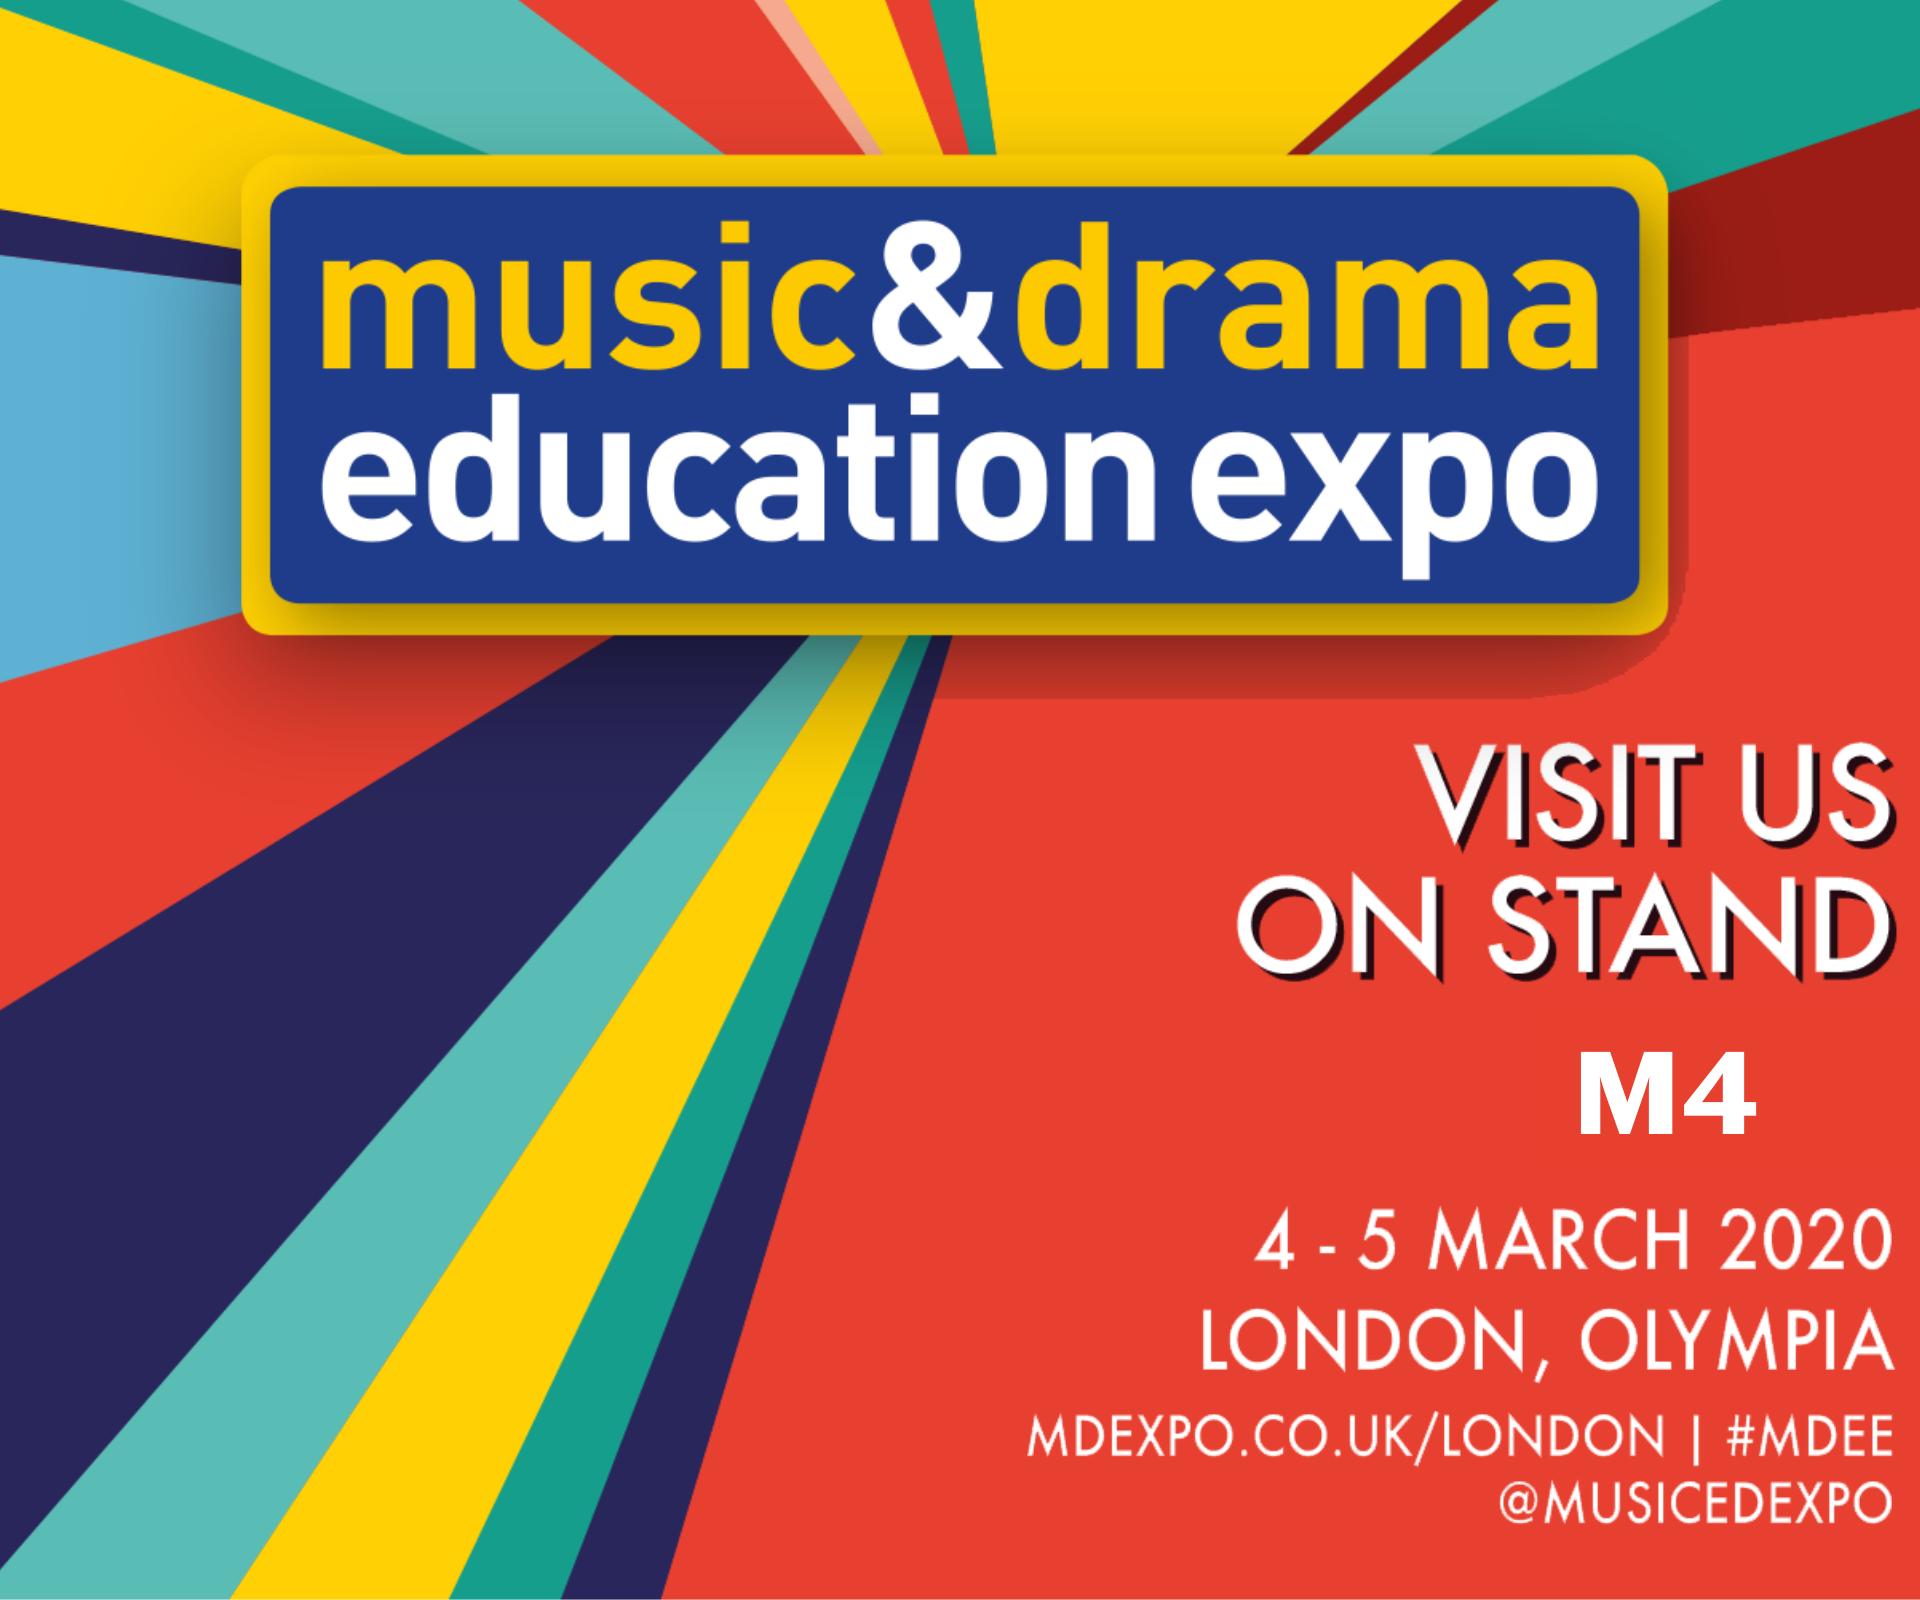 Music & Drama Education Expo London 2020